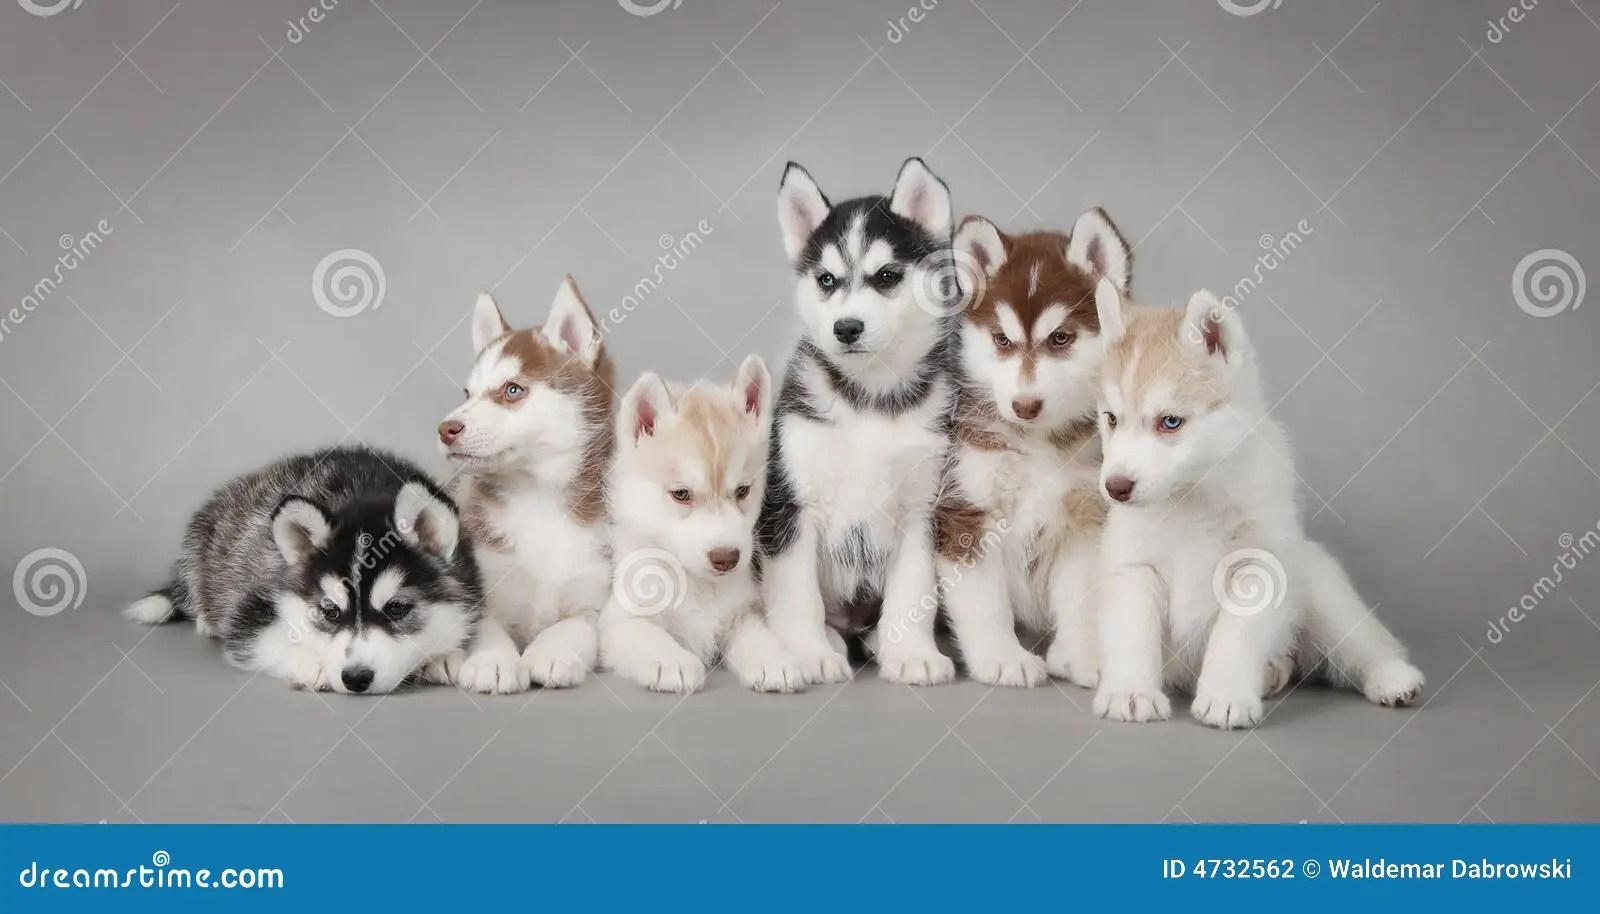 Cute Baby Attitude Wallpaper Husky Dog Puppies Stock Photography Image 4732562